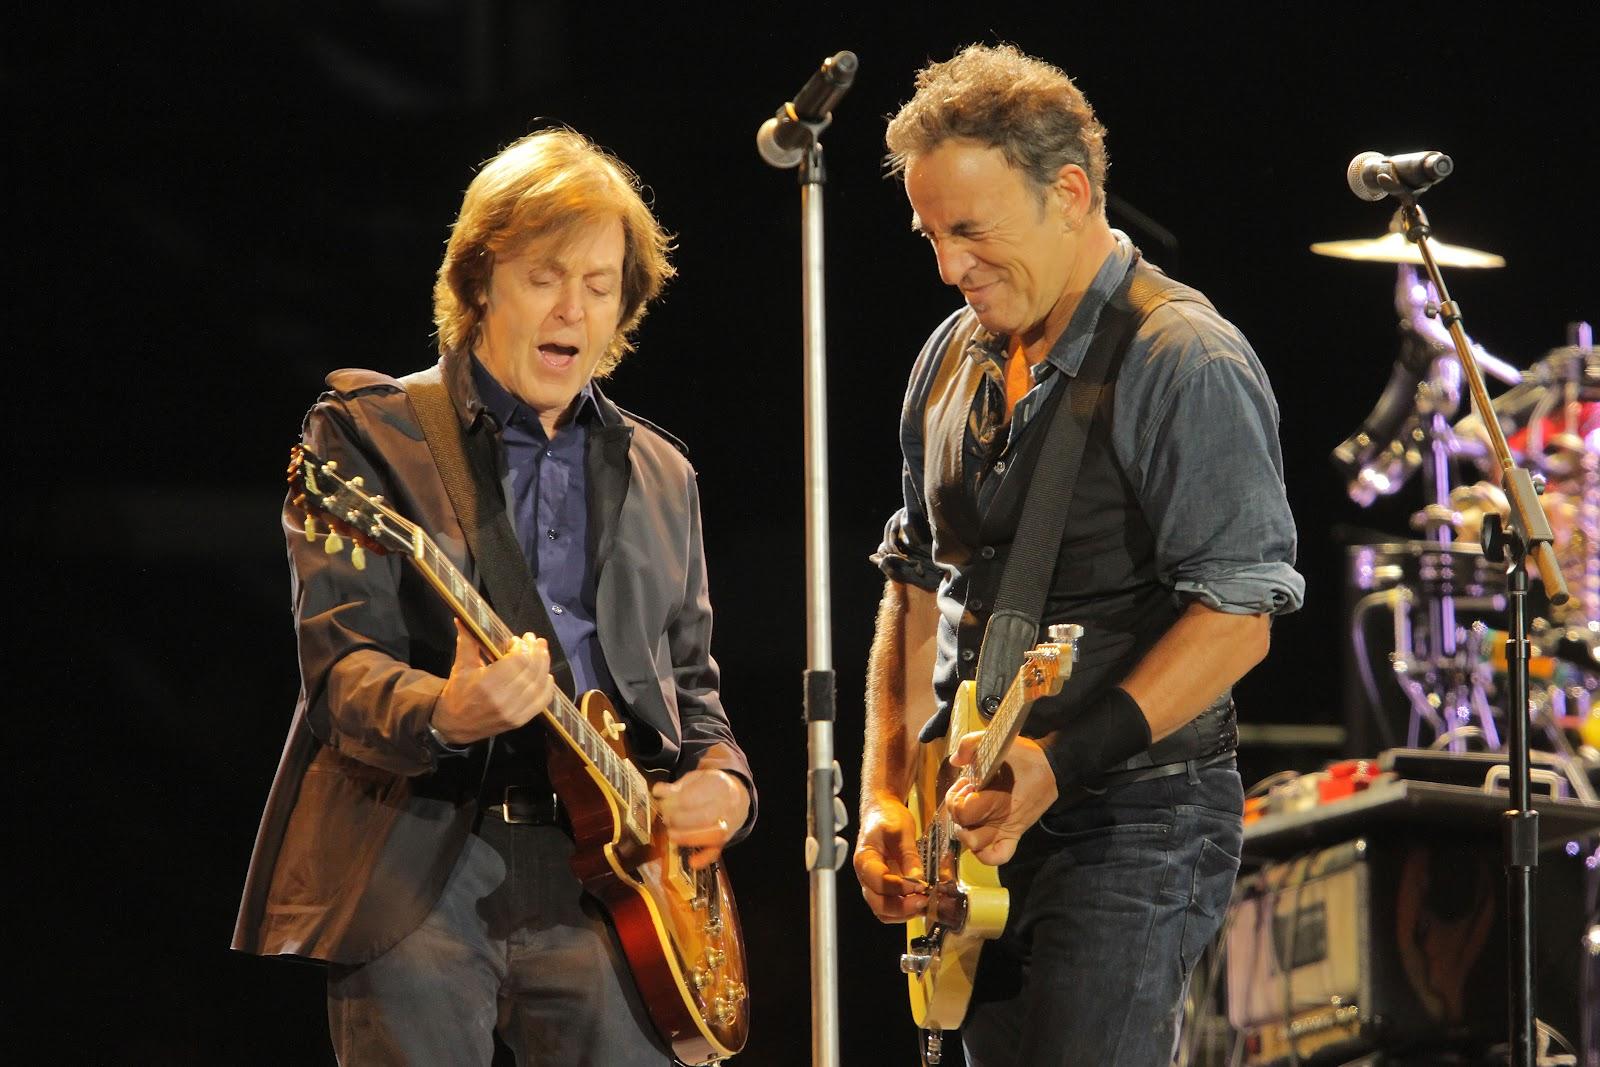 Paul McCartney & Bruce Springsteen